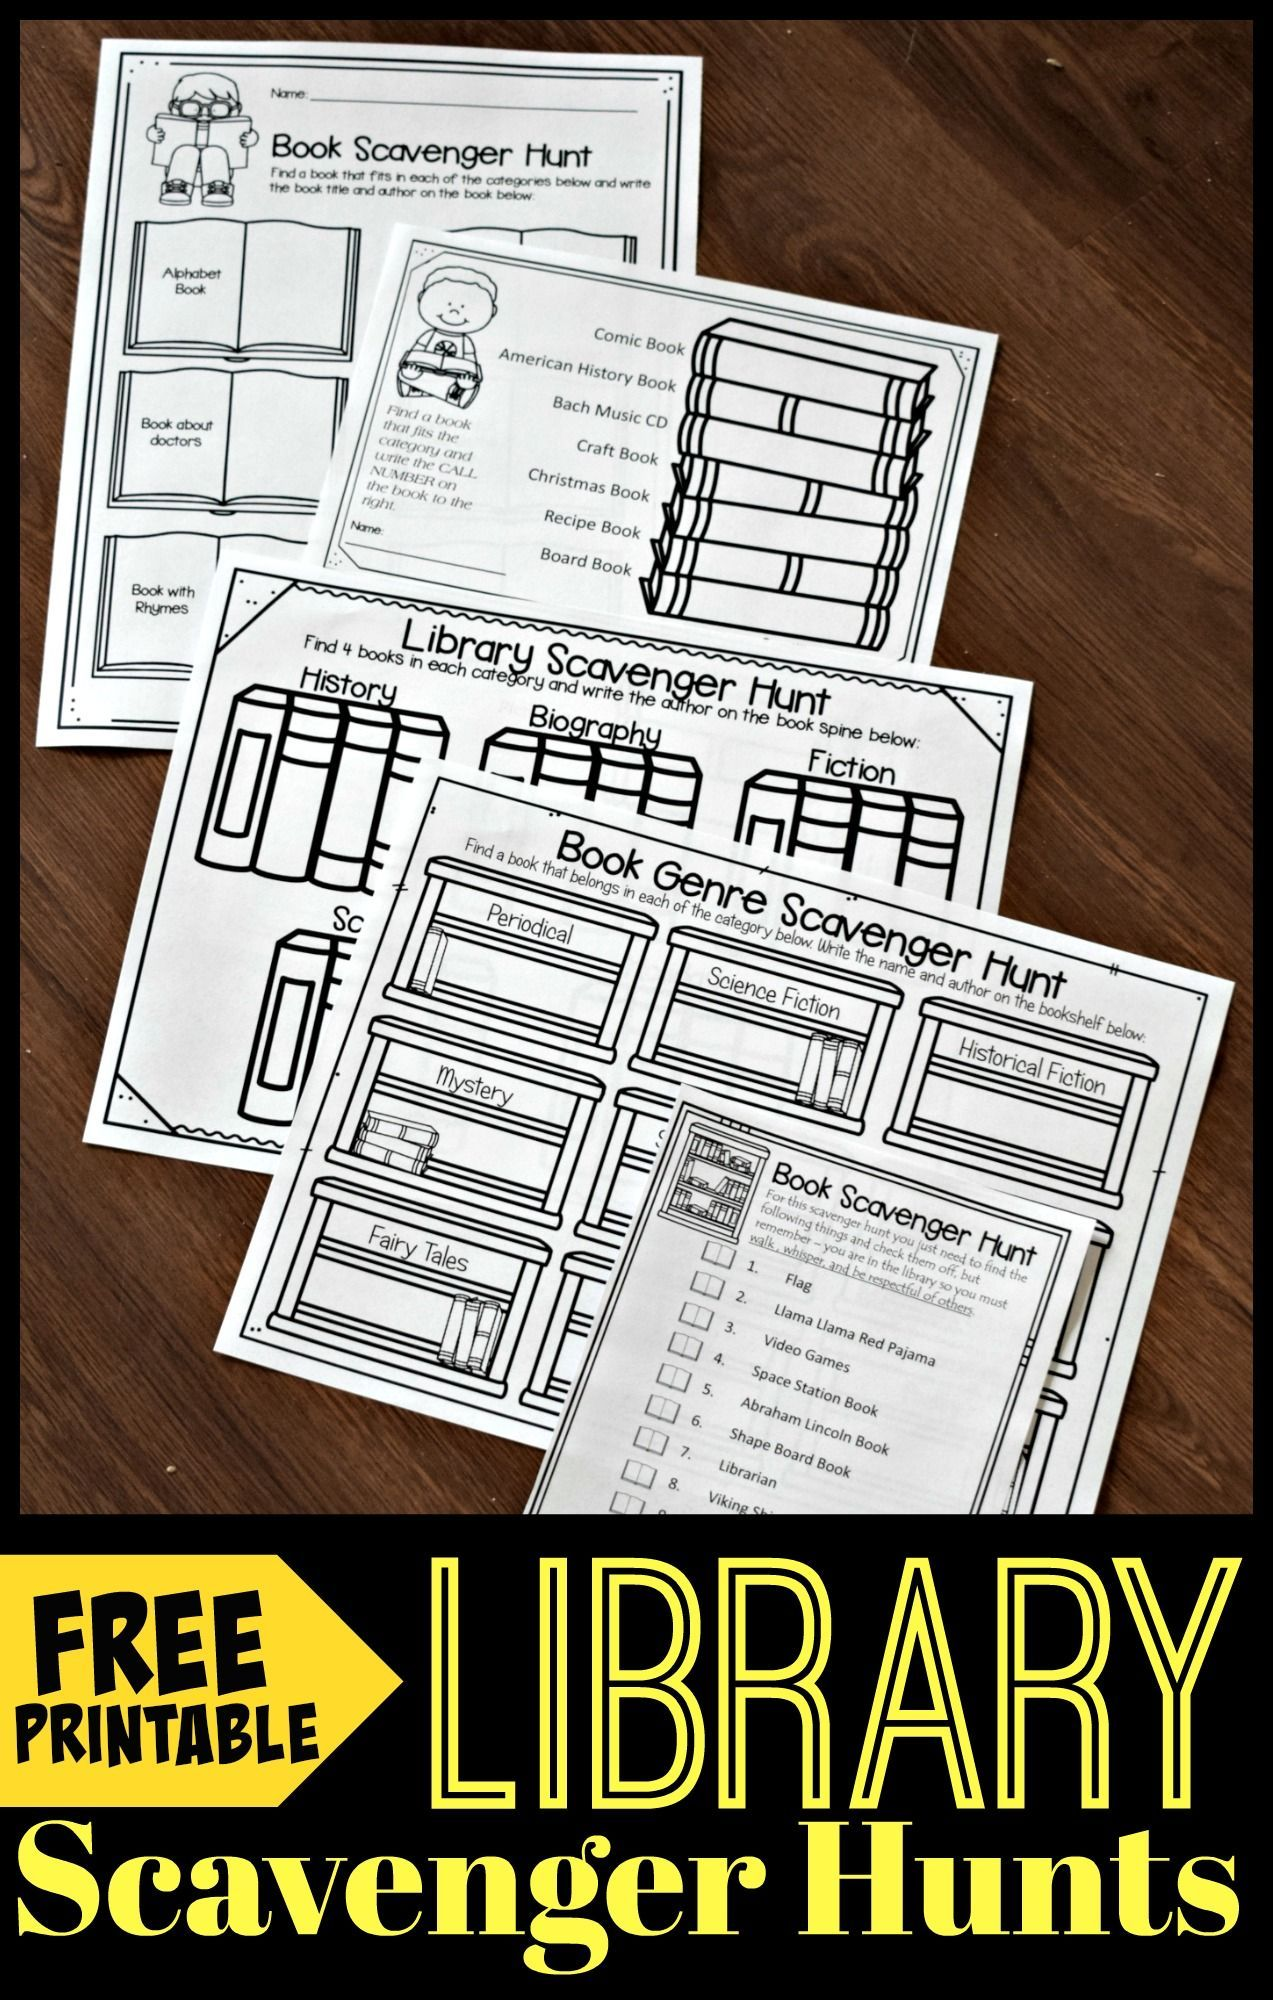 medium resolution of FREE Library Scavenger Hunt   Library scavenger hunts